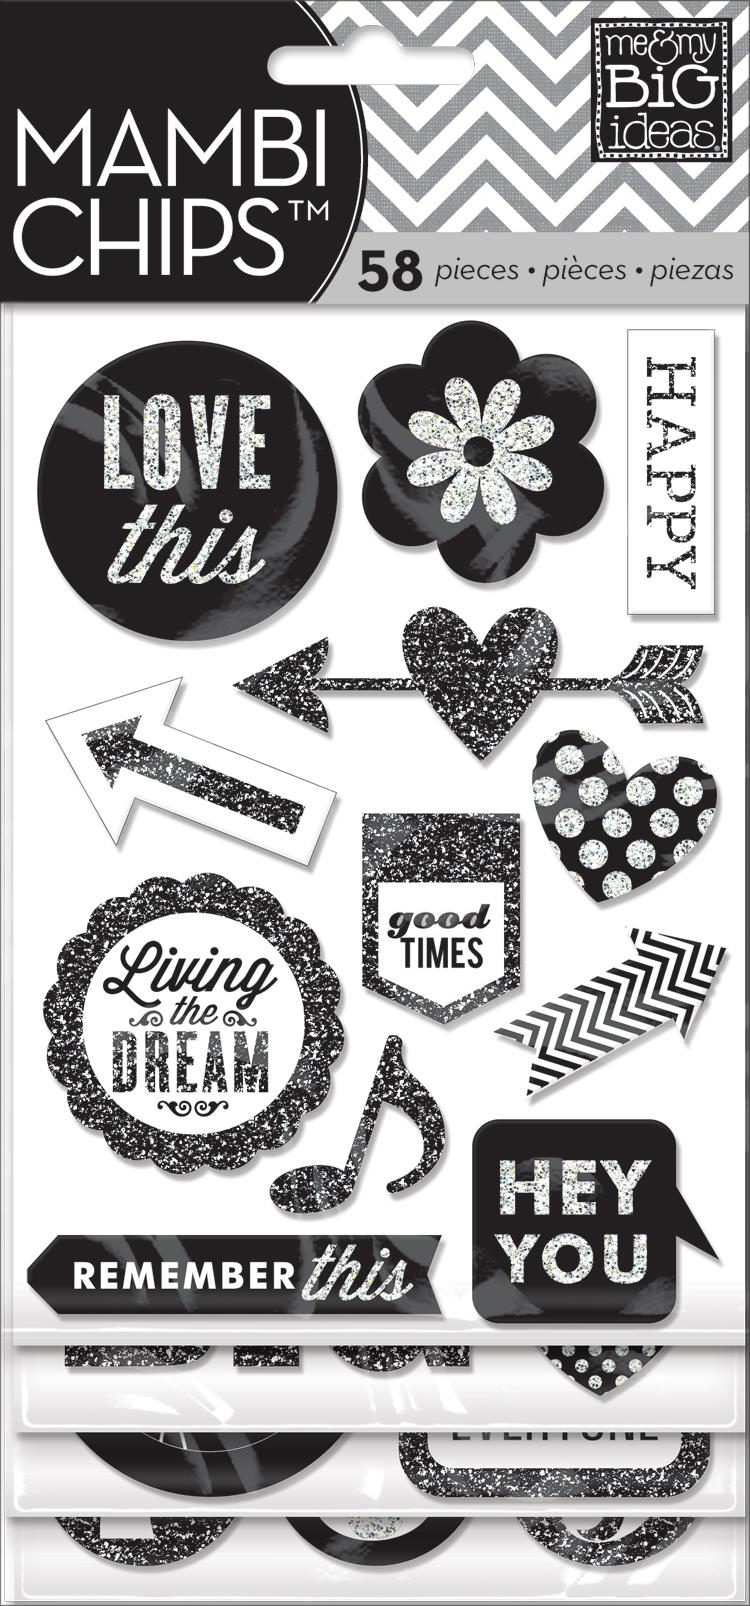 CBVX-18 Black & White glitter embellished chipboard stickers. Scrapbook mambiCHIPS.